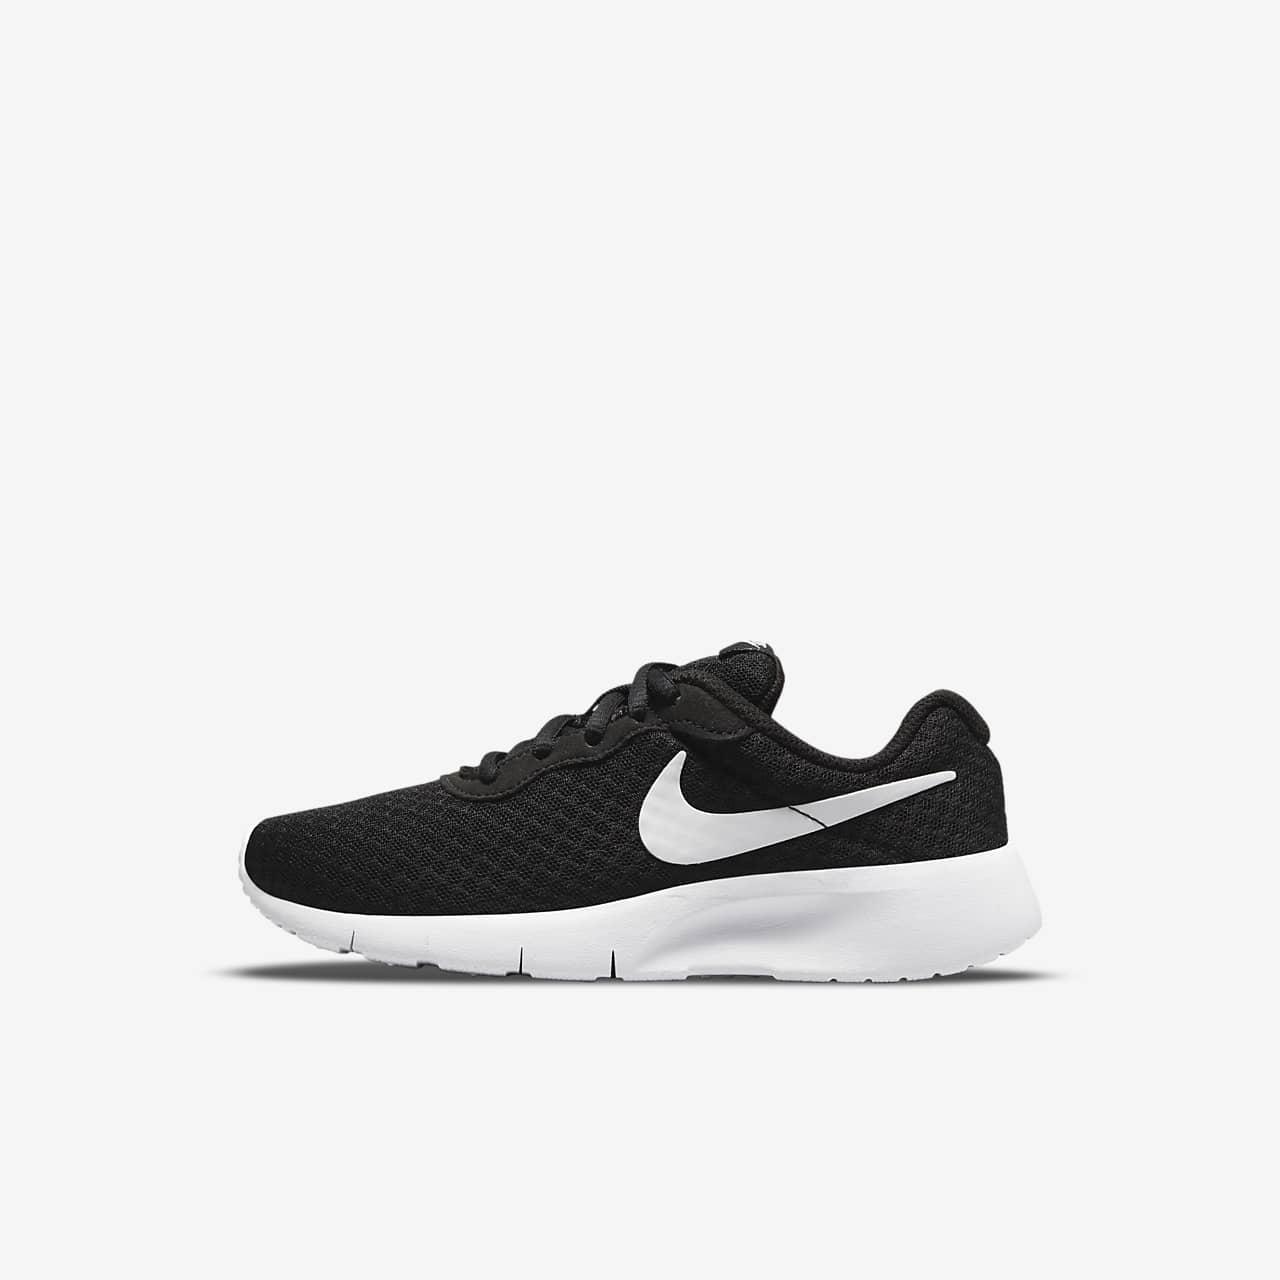 check out dd4e5 f70a6 Nike Tanjun Schuh für jüngere Kinder